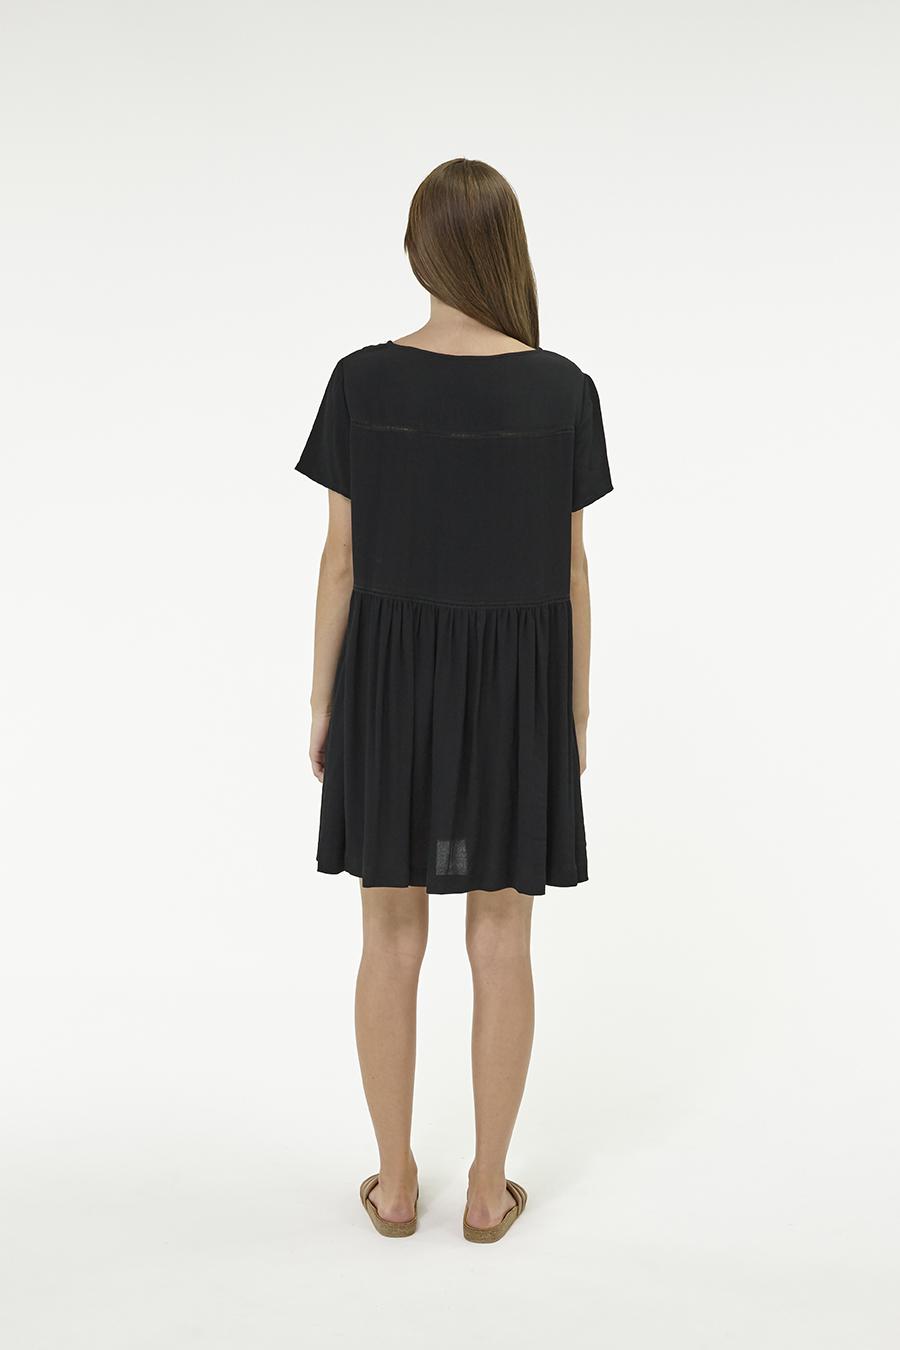 Huffer_Q3-16_W-Park-Dress_Black-03